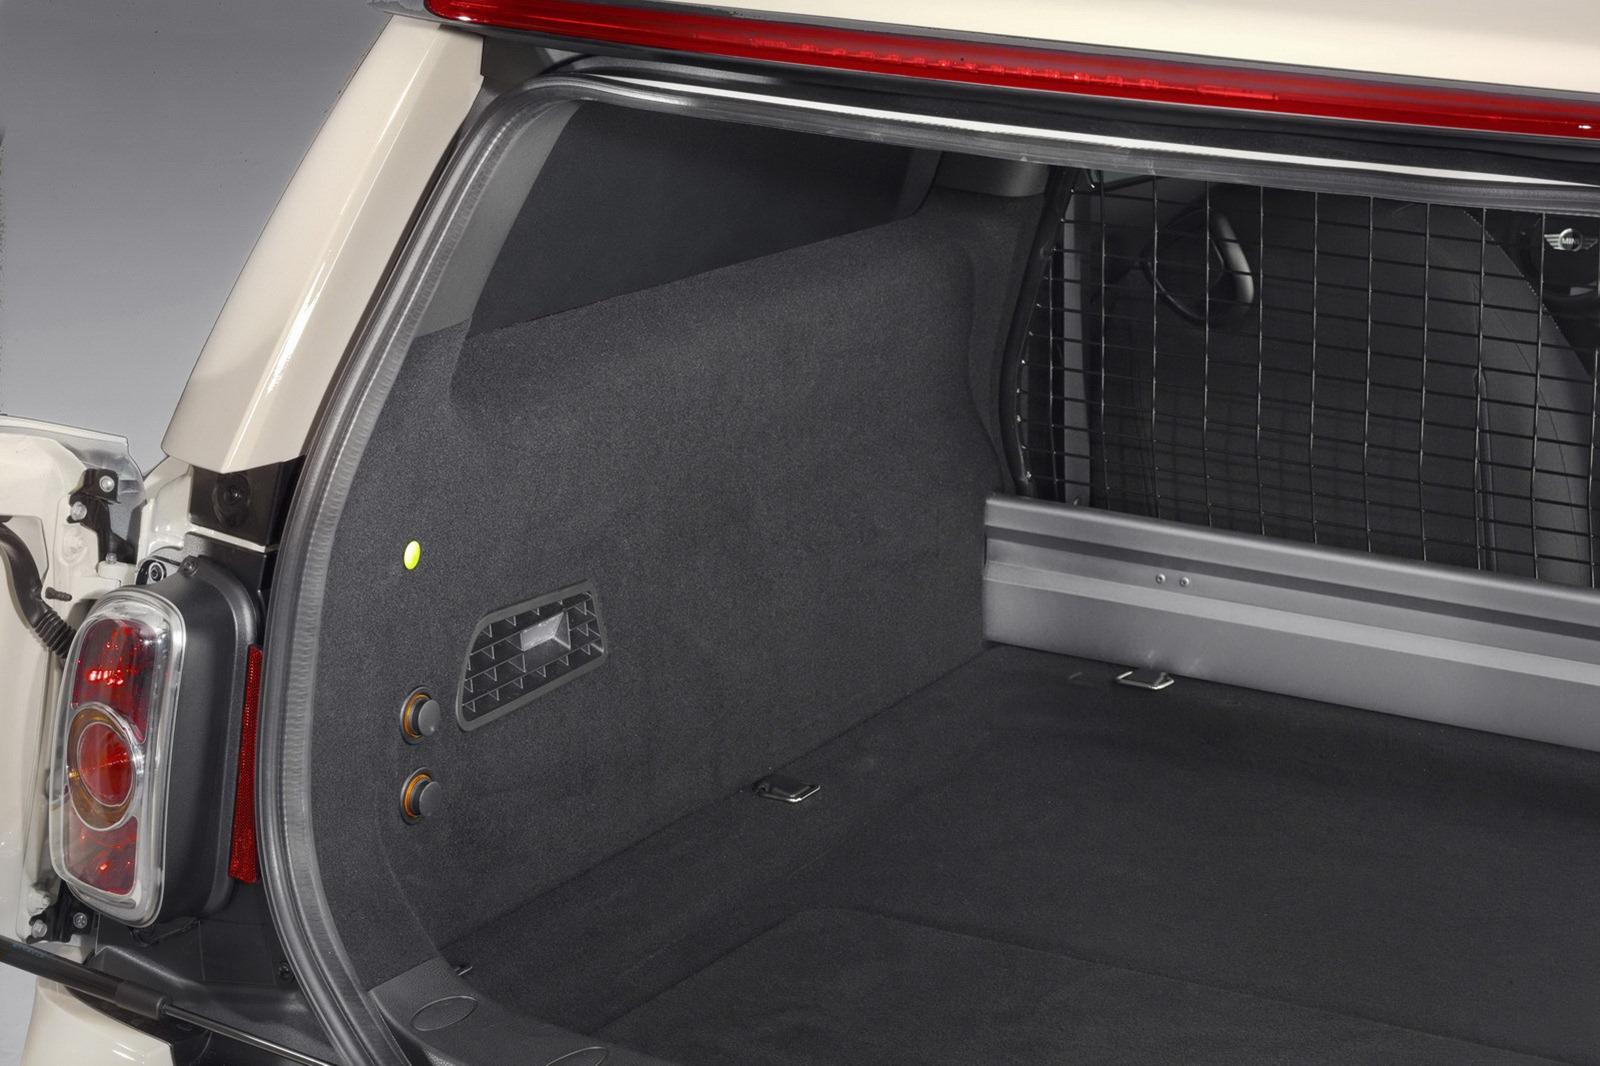 2013-Mini-Clubvan-Production-Model-10.jpg?imgmax=1800